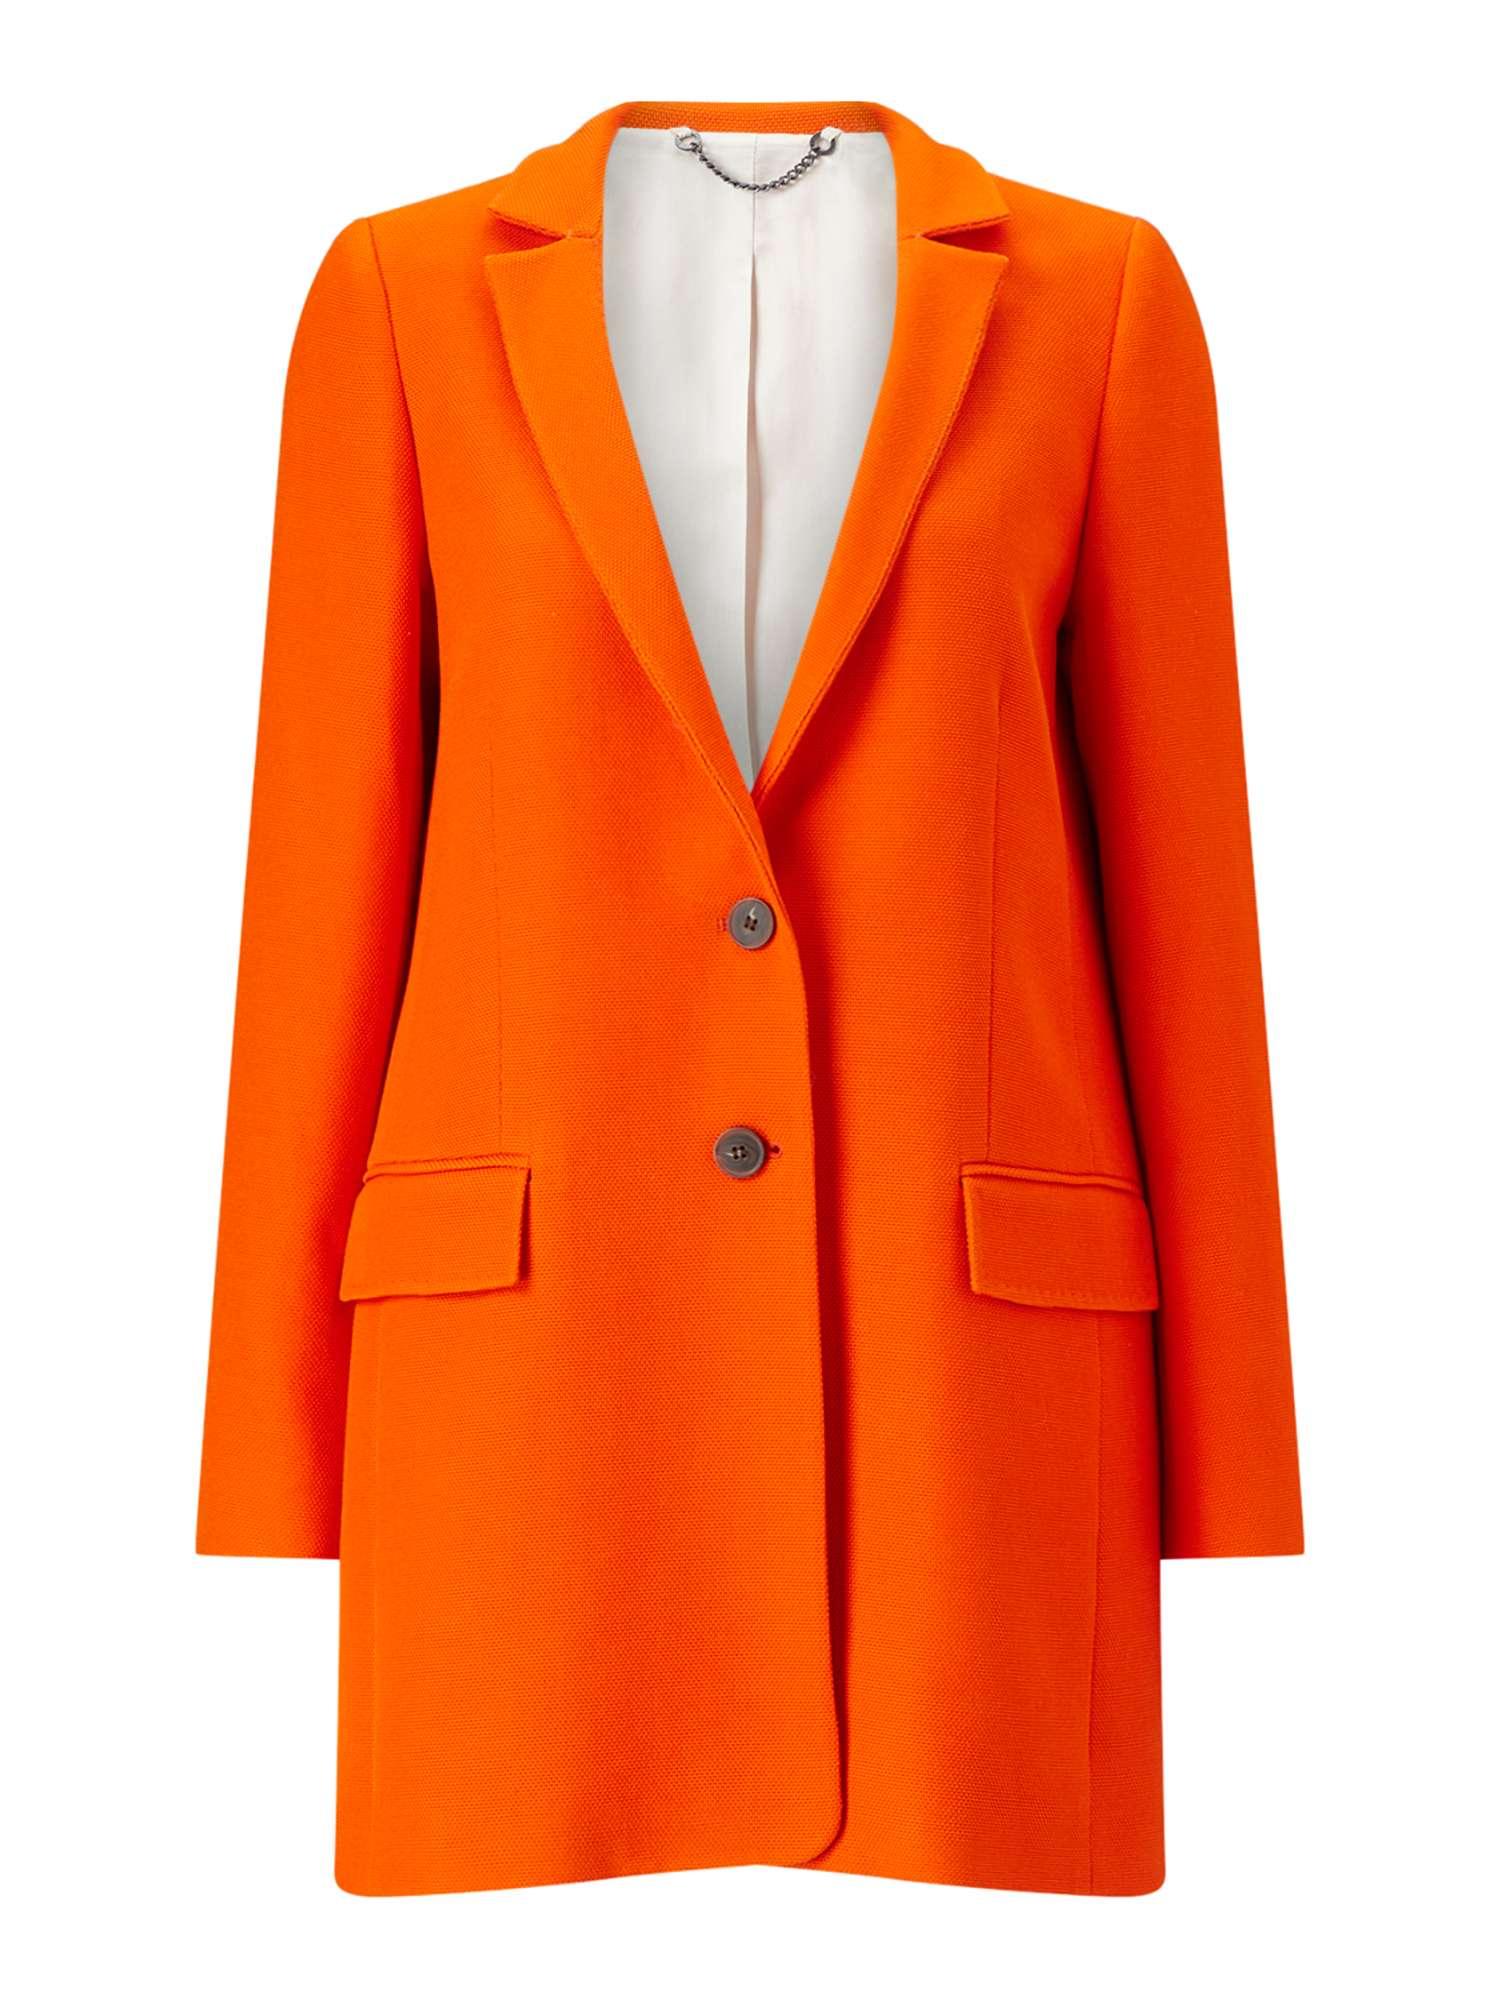 Jigsaw_orange coat.jpg